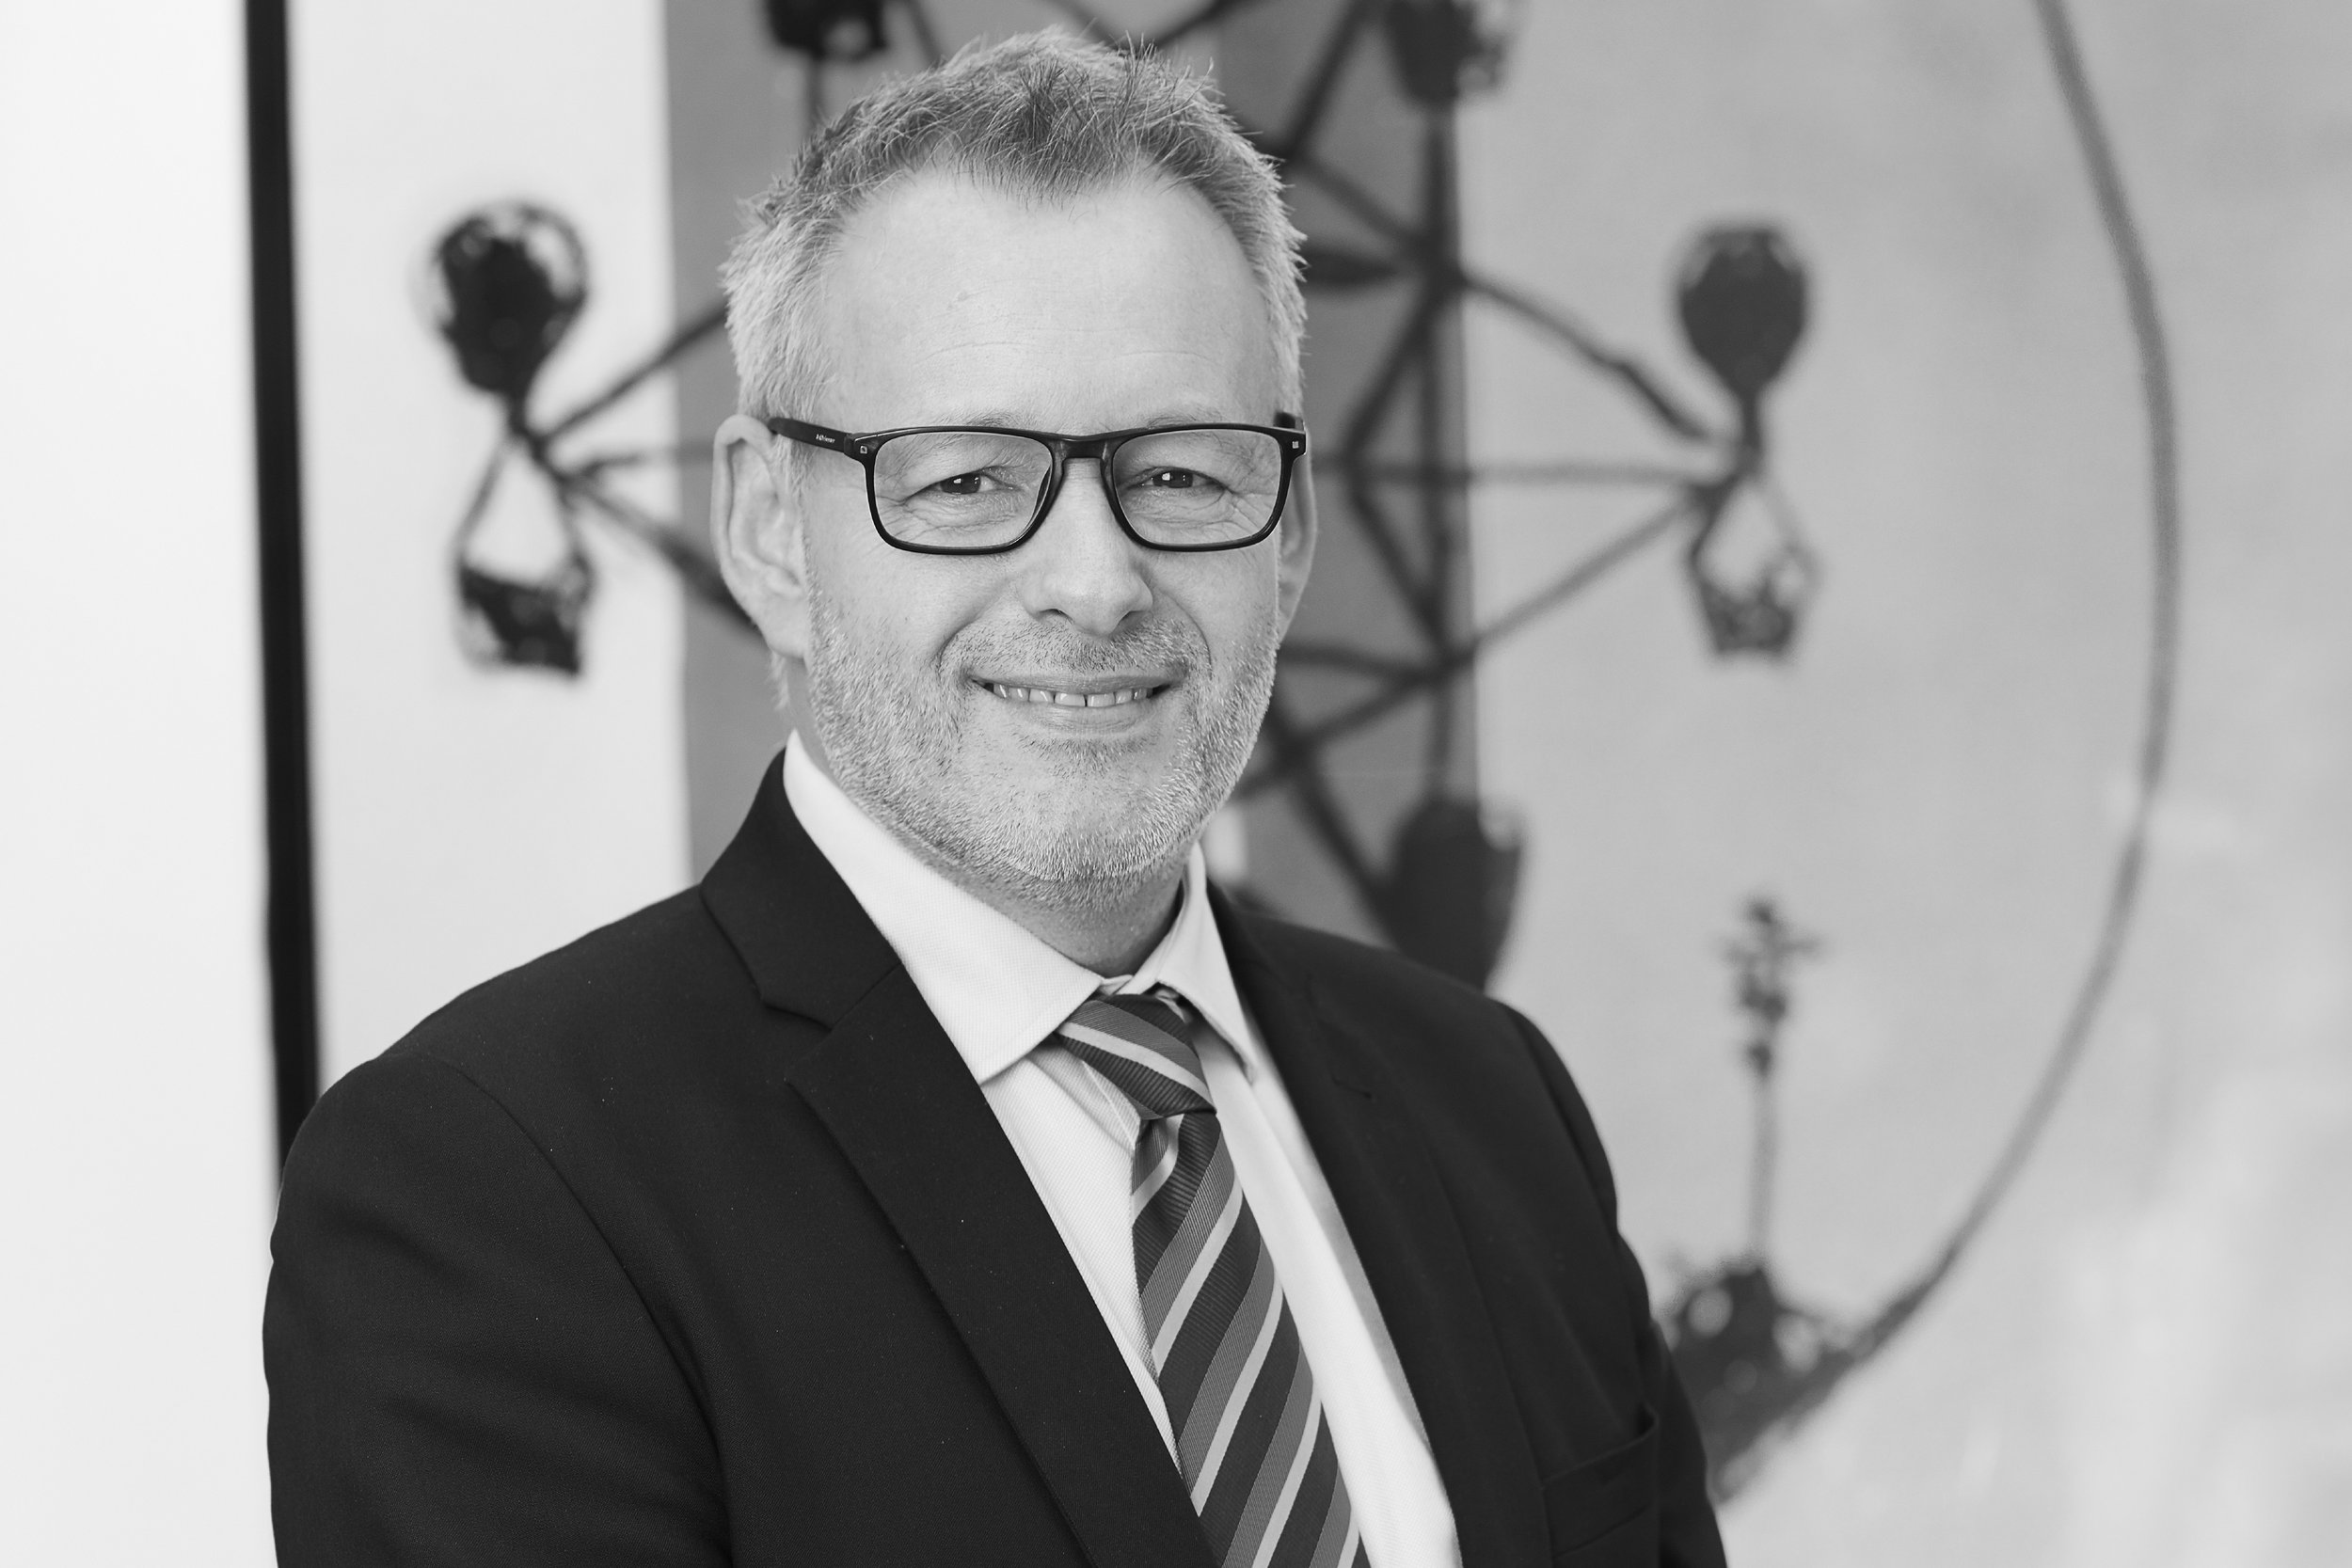 Lars Sønderskov  | Sekretariatschef  Tlf: 2627 3754  E-mail:  ls@byggesoc.dk